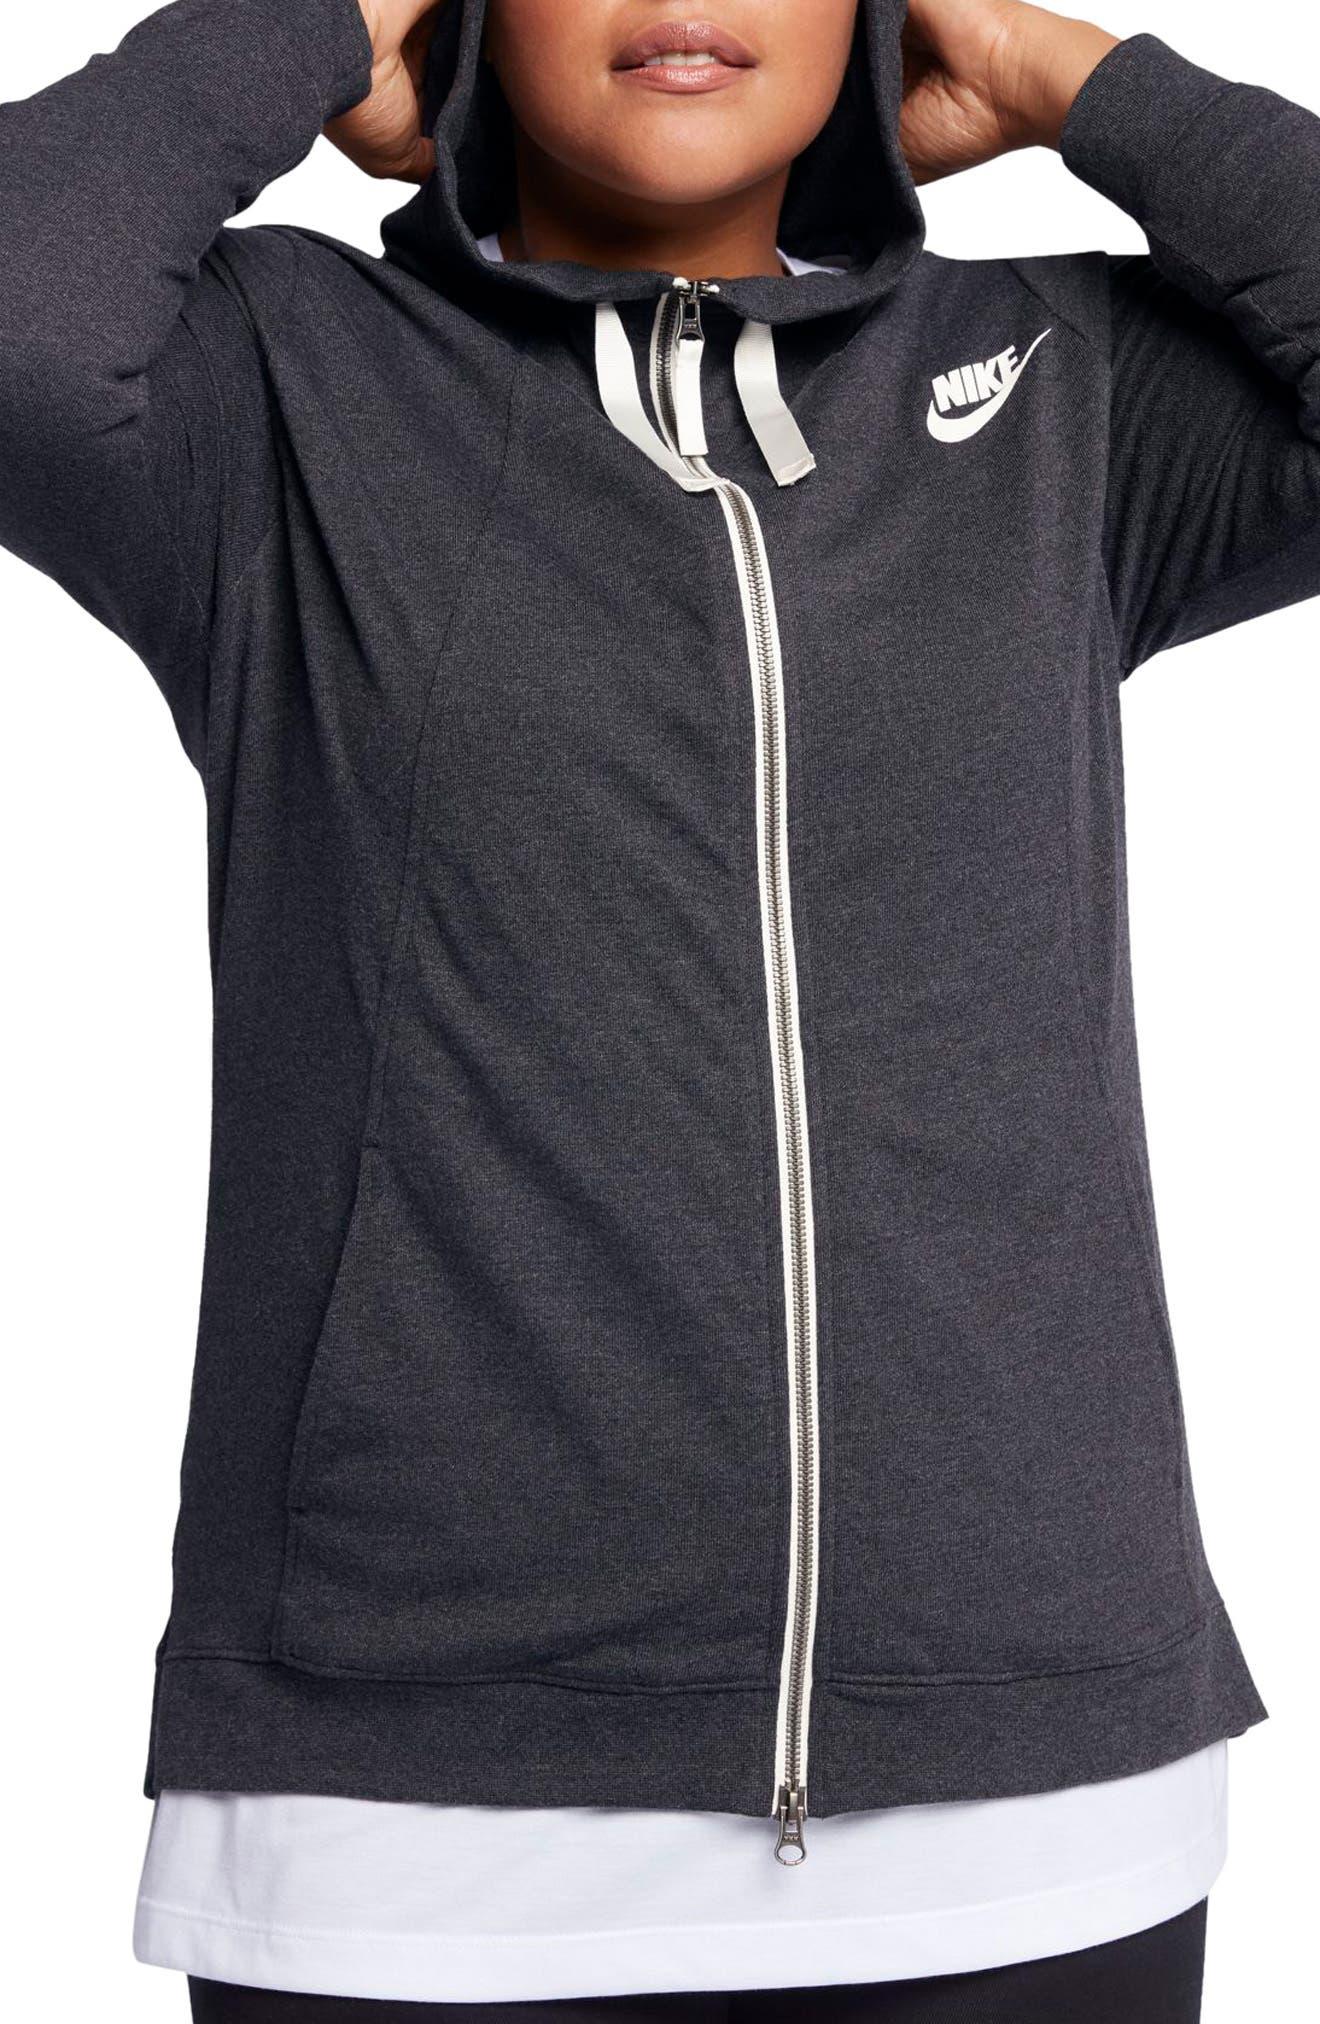 Sportswear Gym Classic Hoodie,                         Main,                         color, Black Heather/ Sail